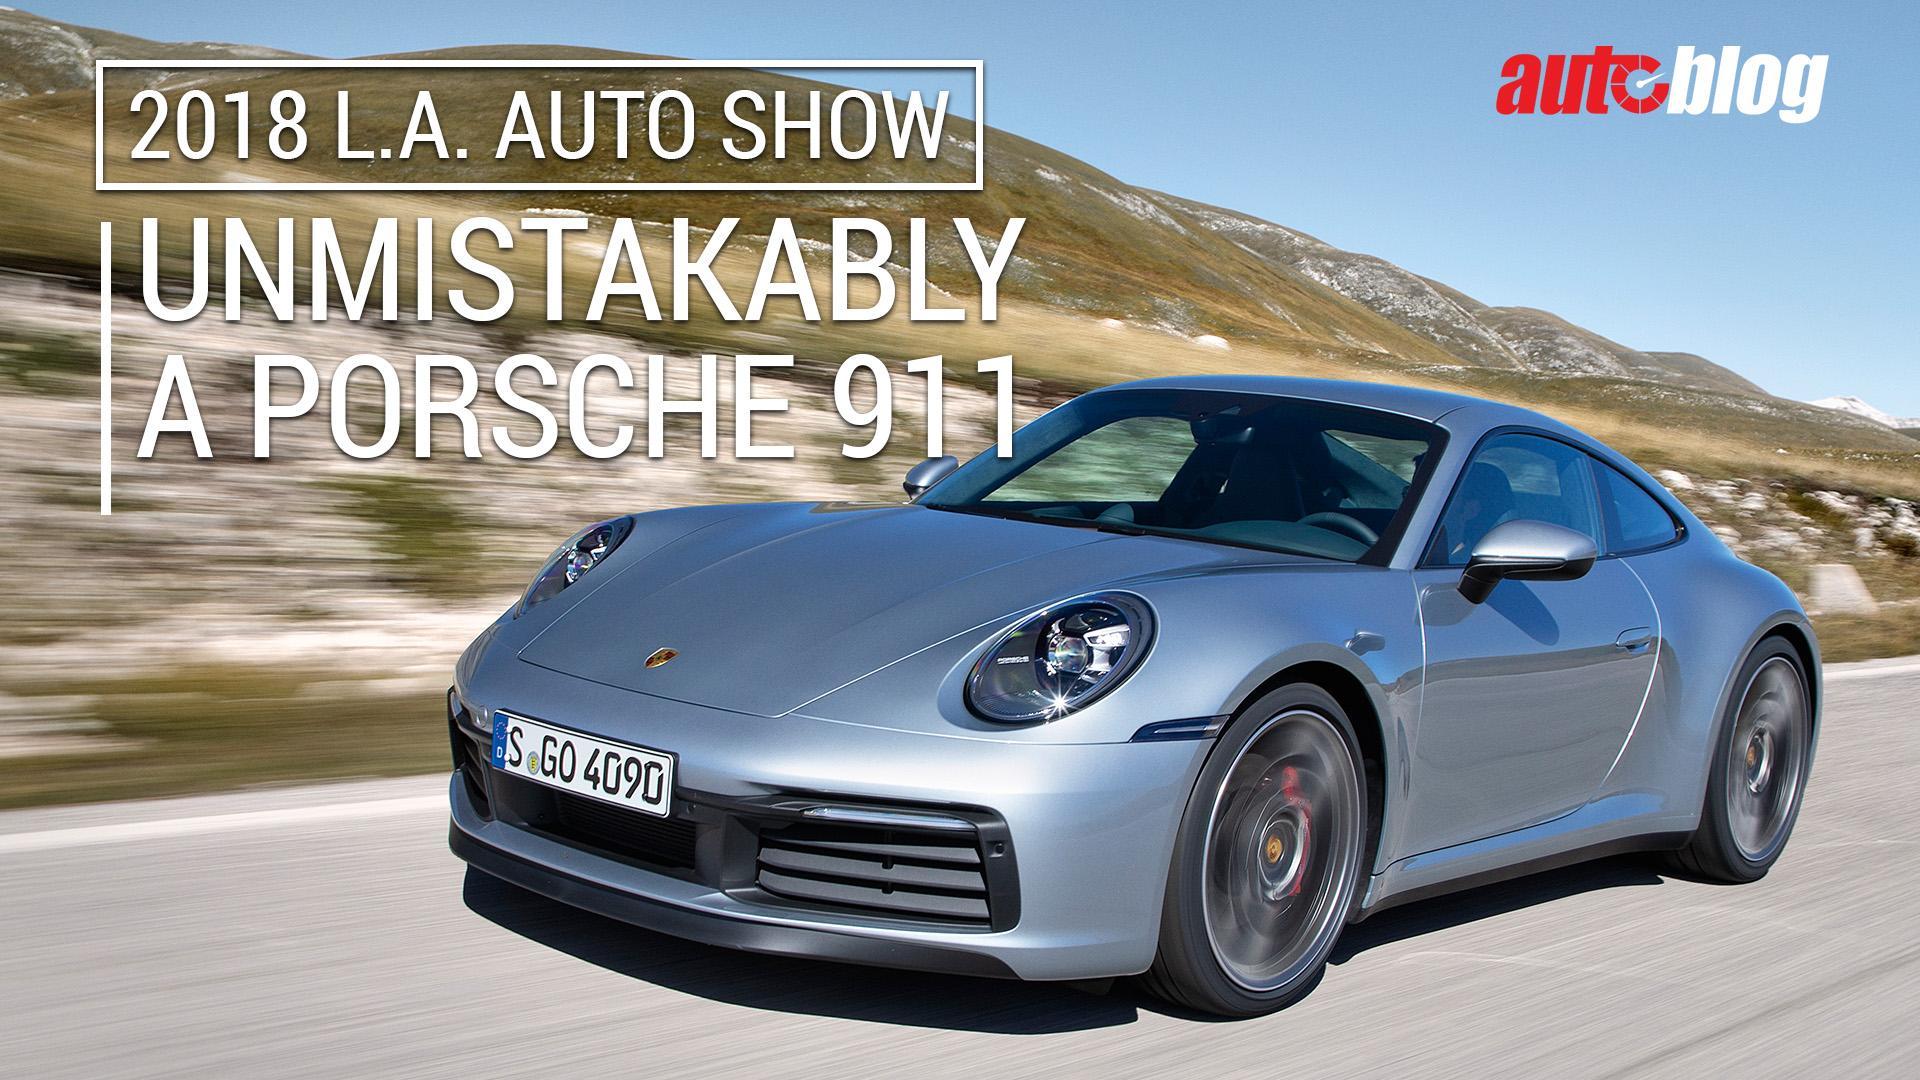 Wing vents windows car clipart clipart Porsche details the new 911\'s active aerodynamics | Autoblog clipart